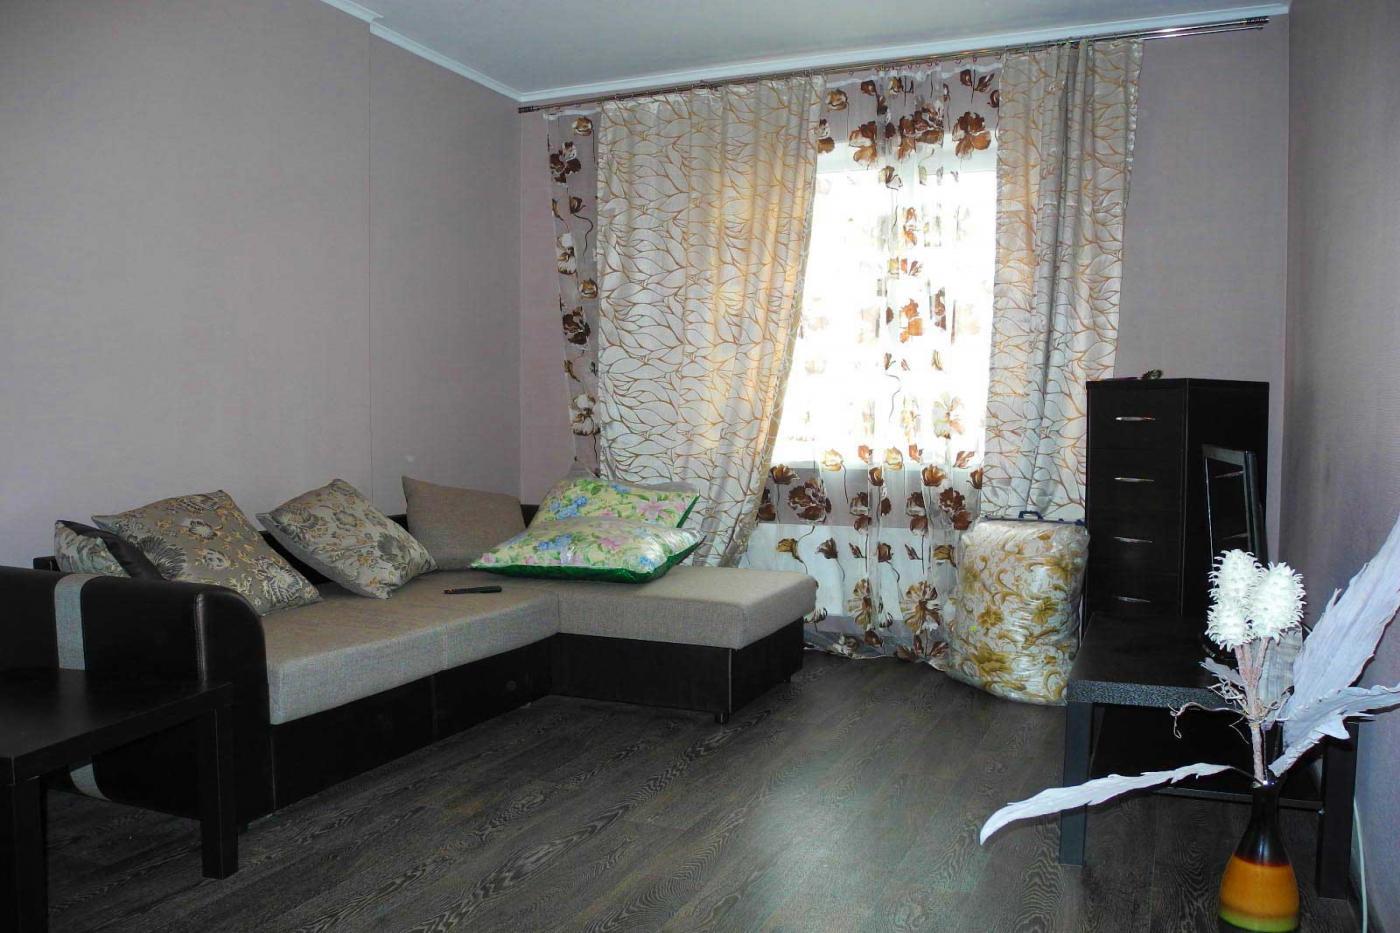 1-комнатная квартира посуточно (вариант № 3875), ул. Ленинский проспект, фото № 2